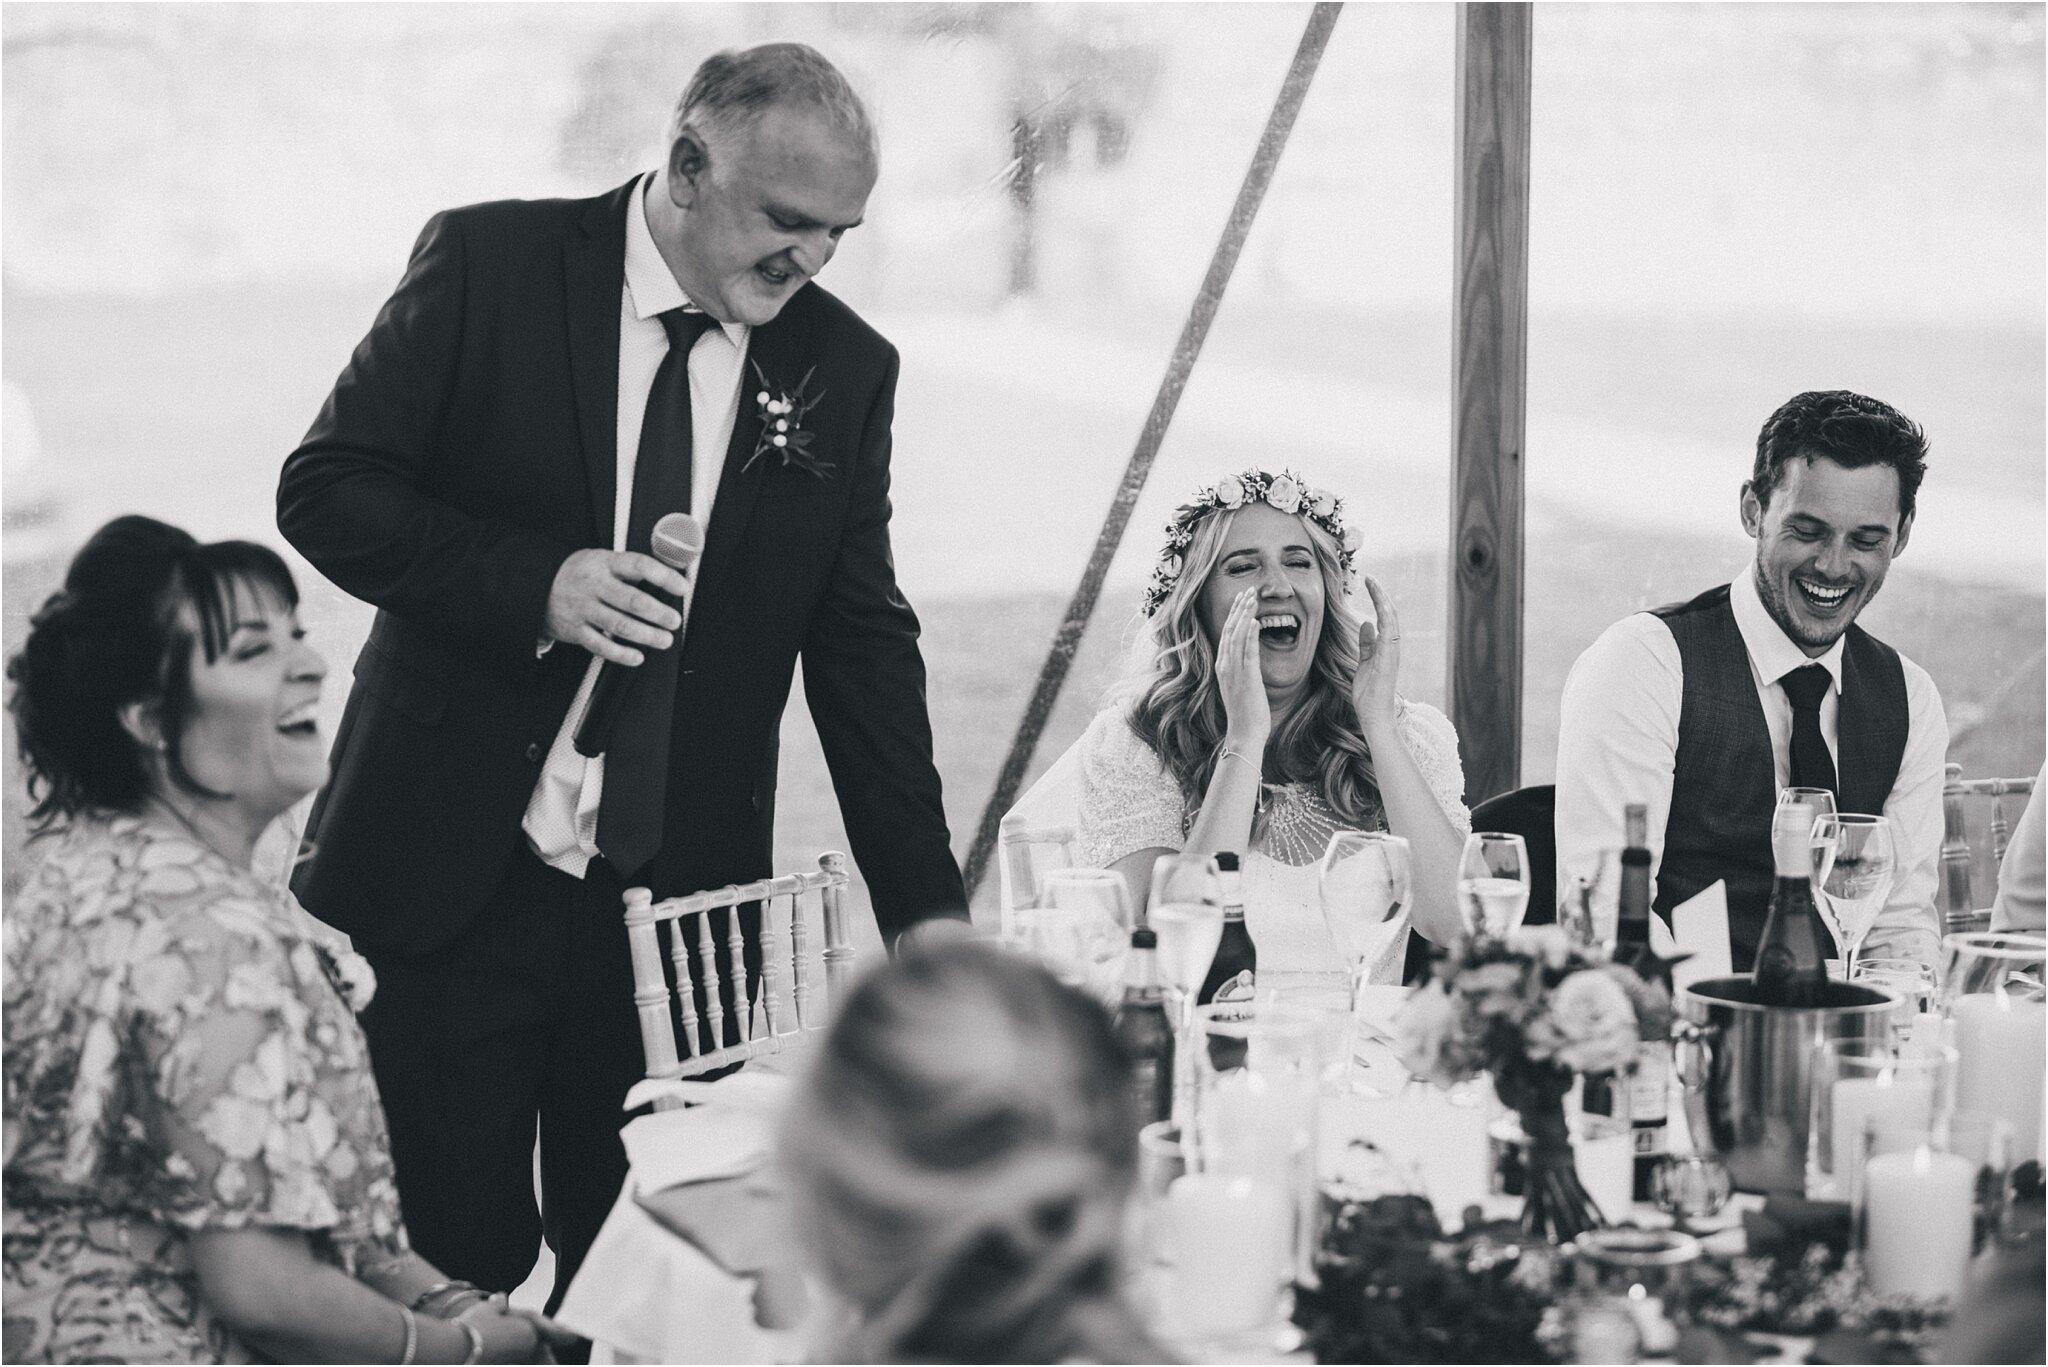 Dorfold Hall marquee wedding 00045.jpg